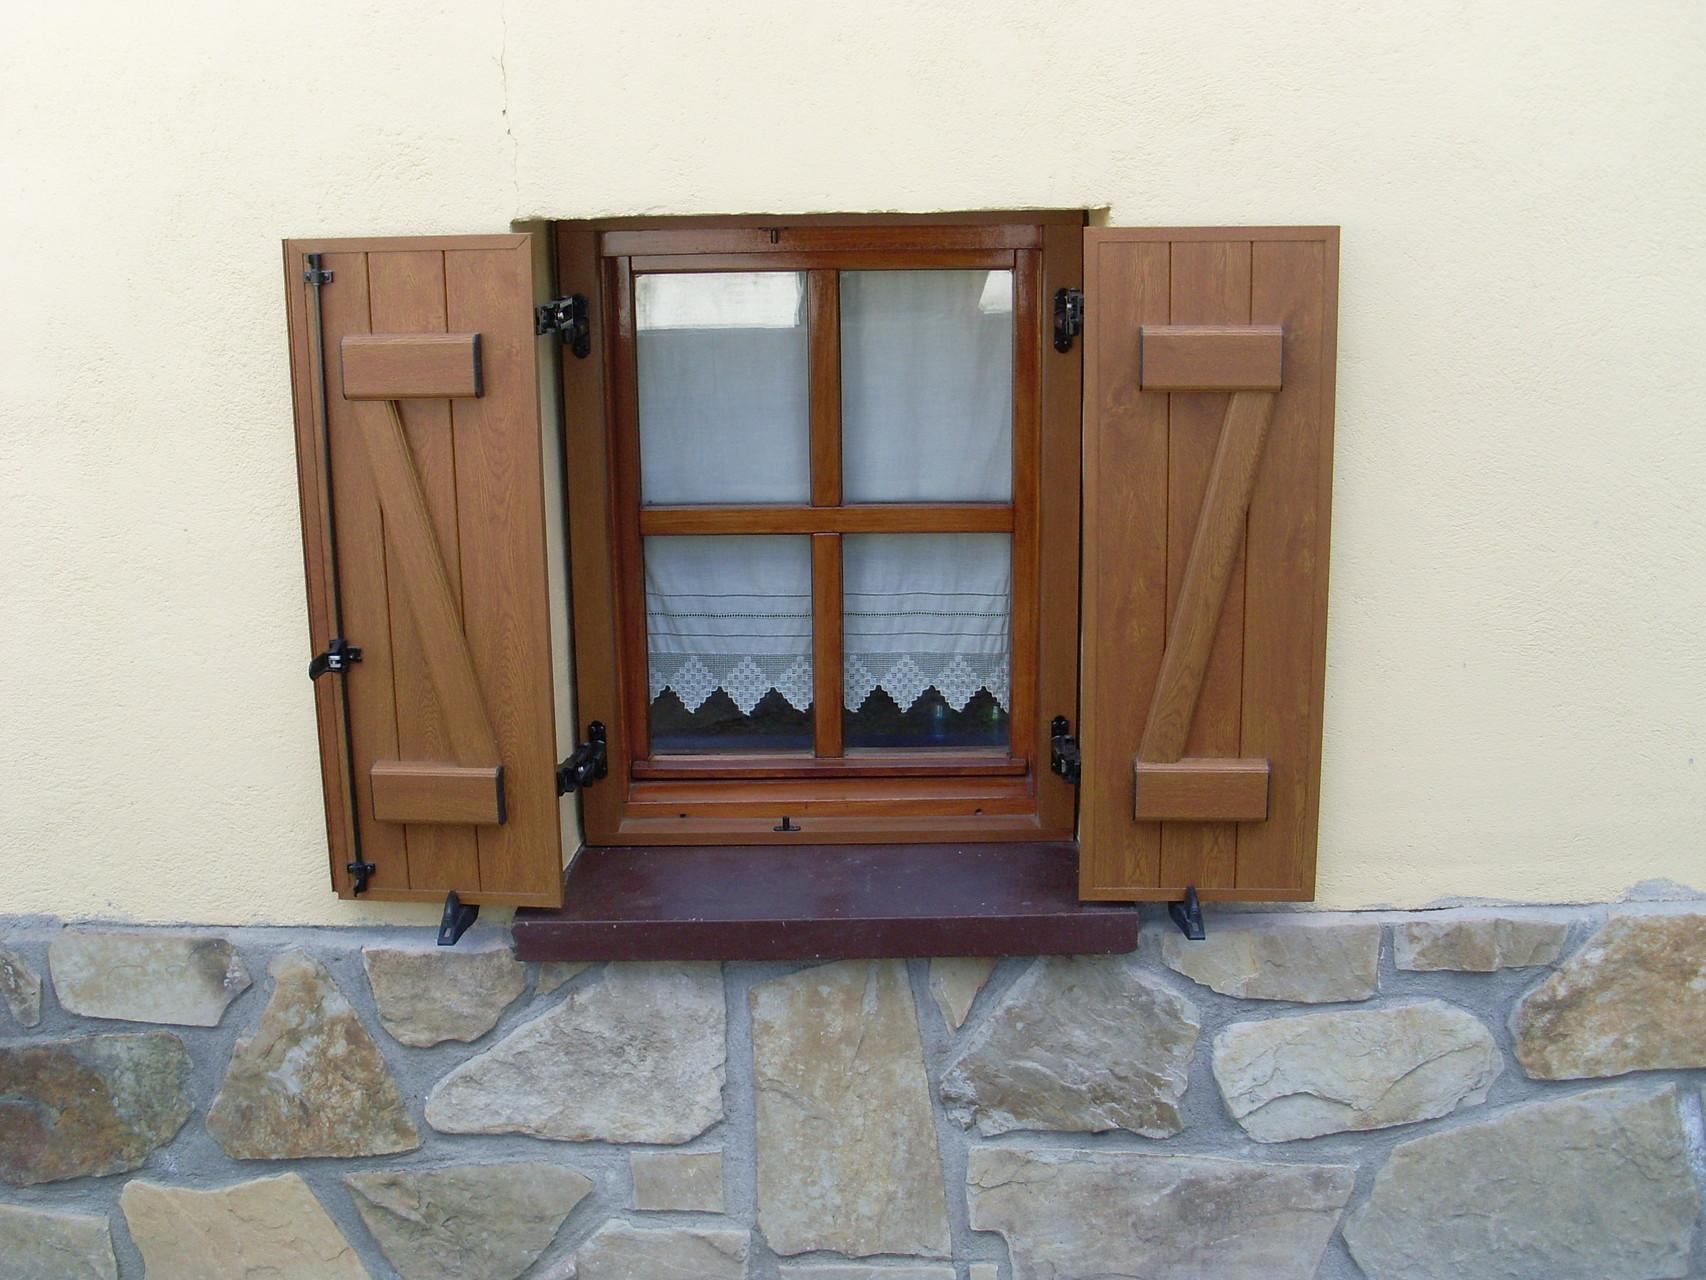 Contraventanas aluminios no in gar s for Porticones madera exteriores